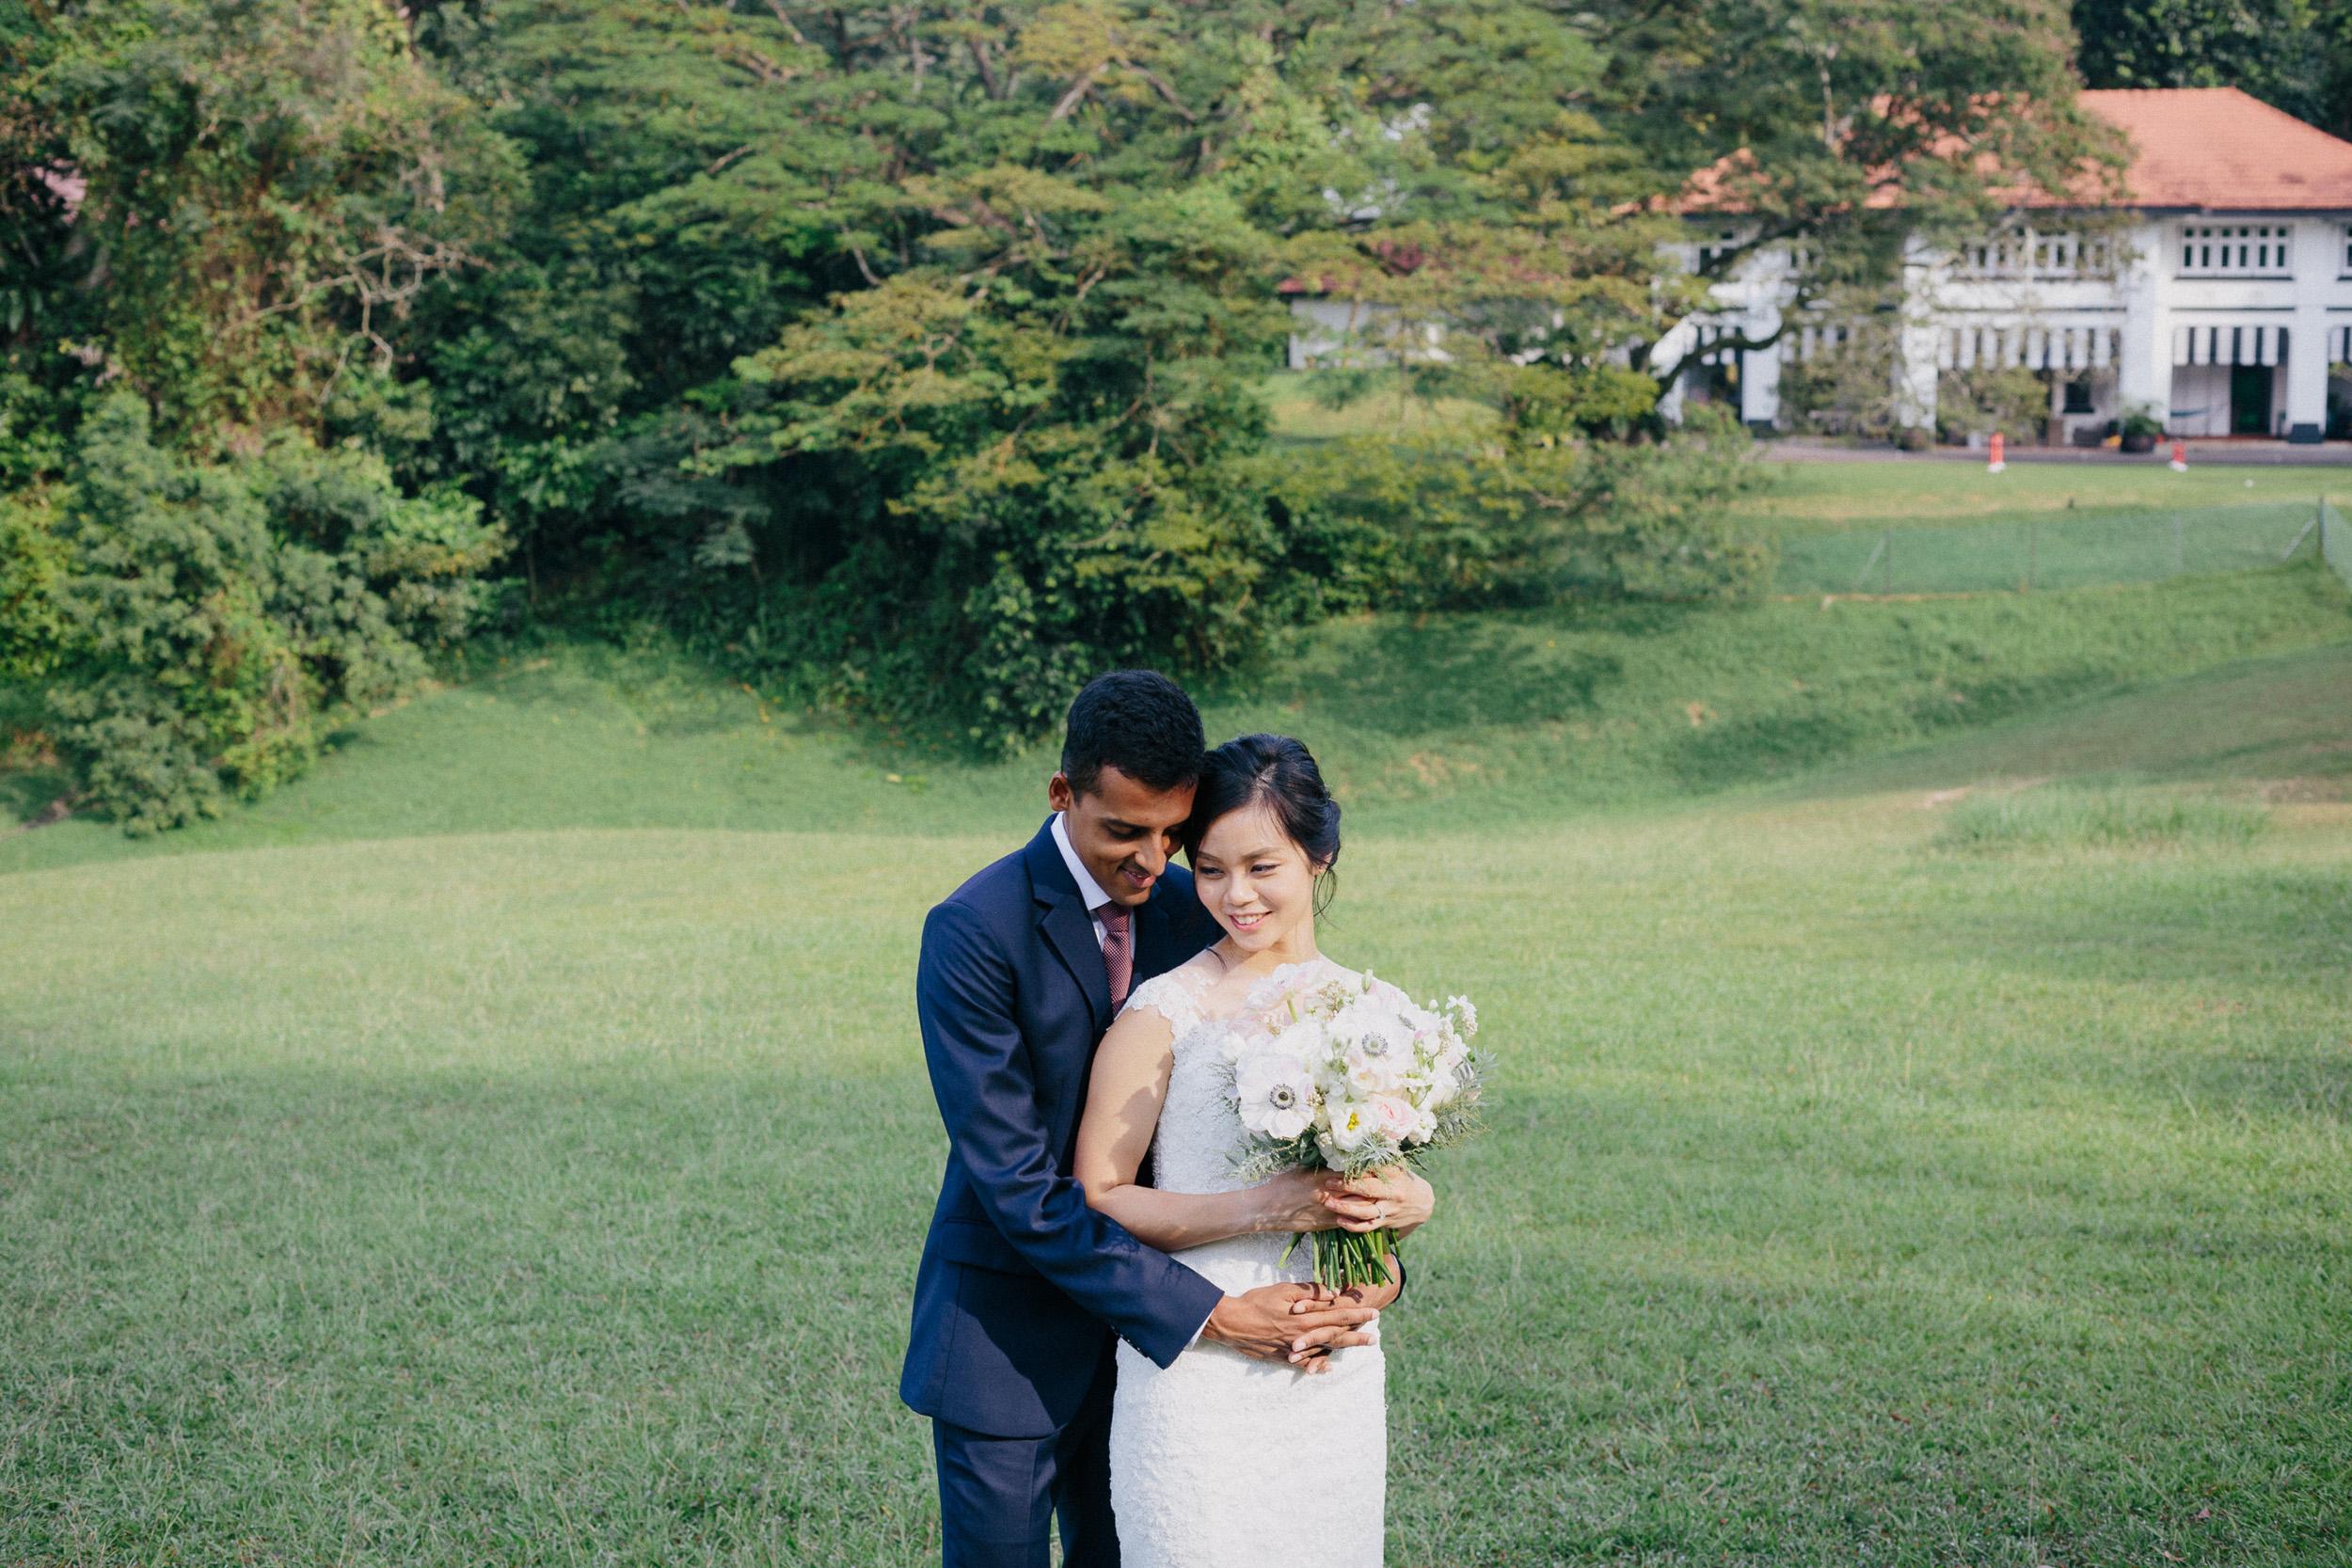 singapore-wedding-photographer-photography-wmt2017-131.jpg